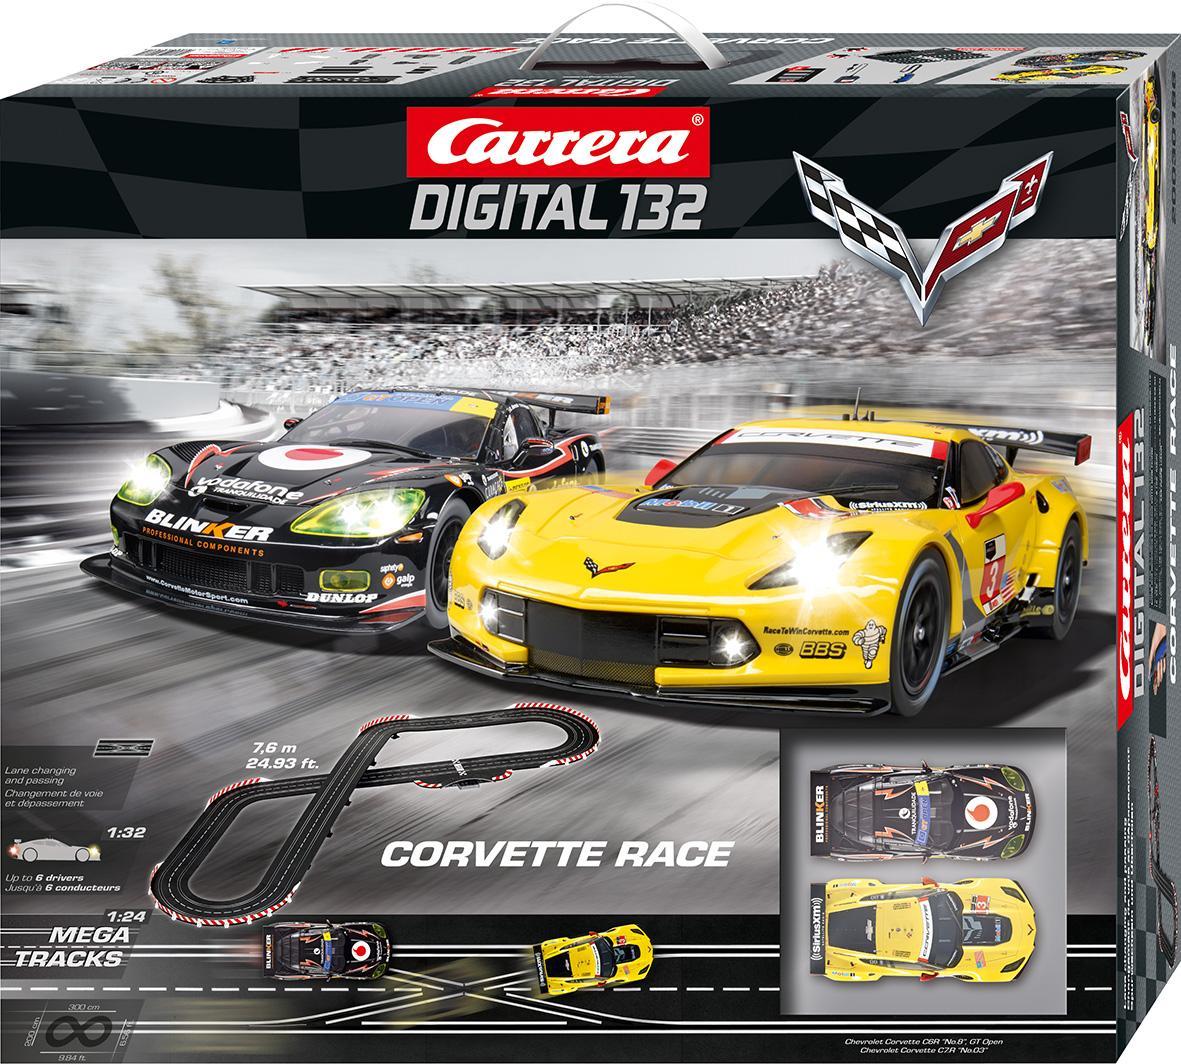 Amazon.com: Carrera Corvette Race Slot Car Track: Toys & Games